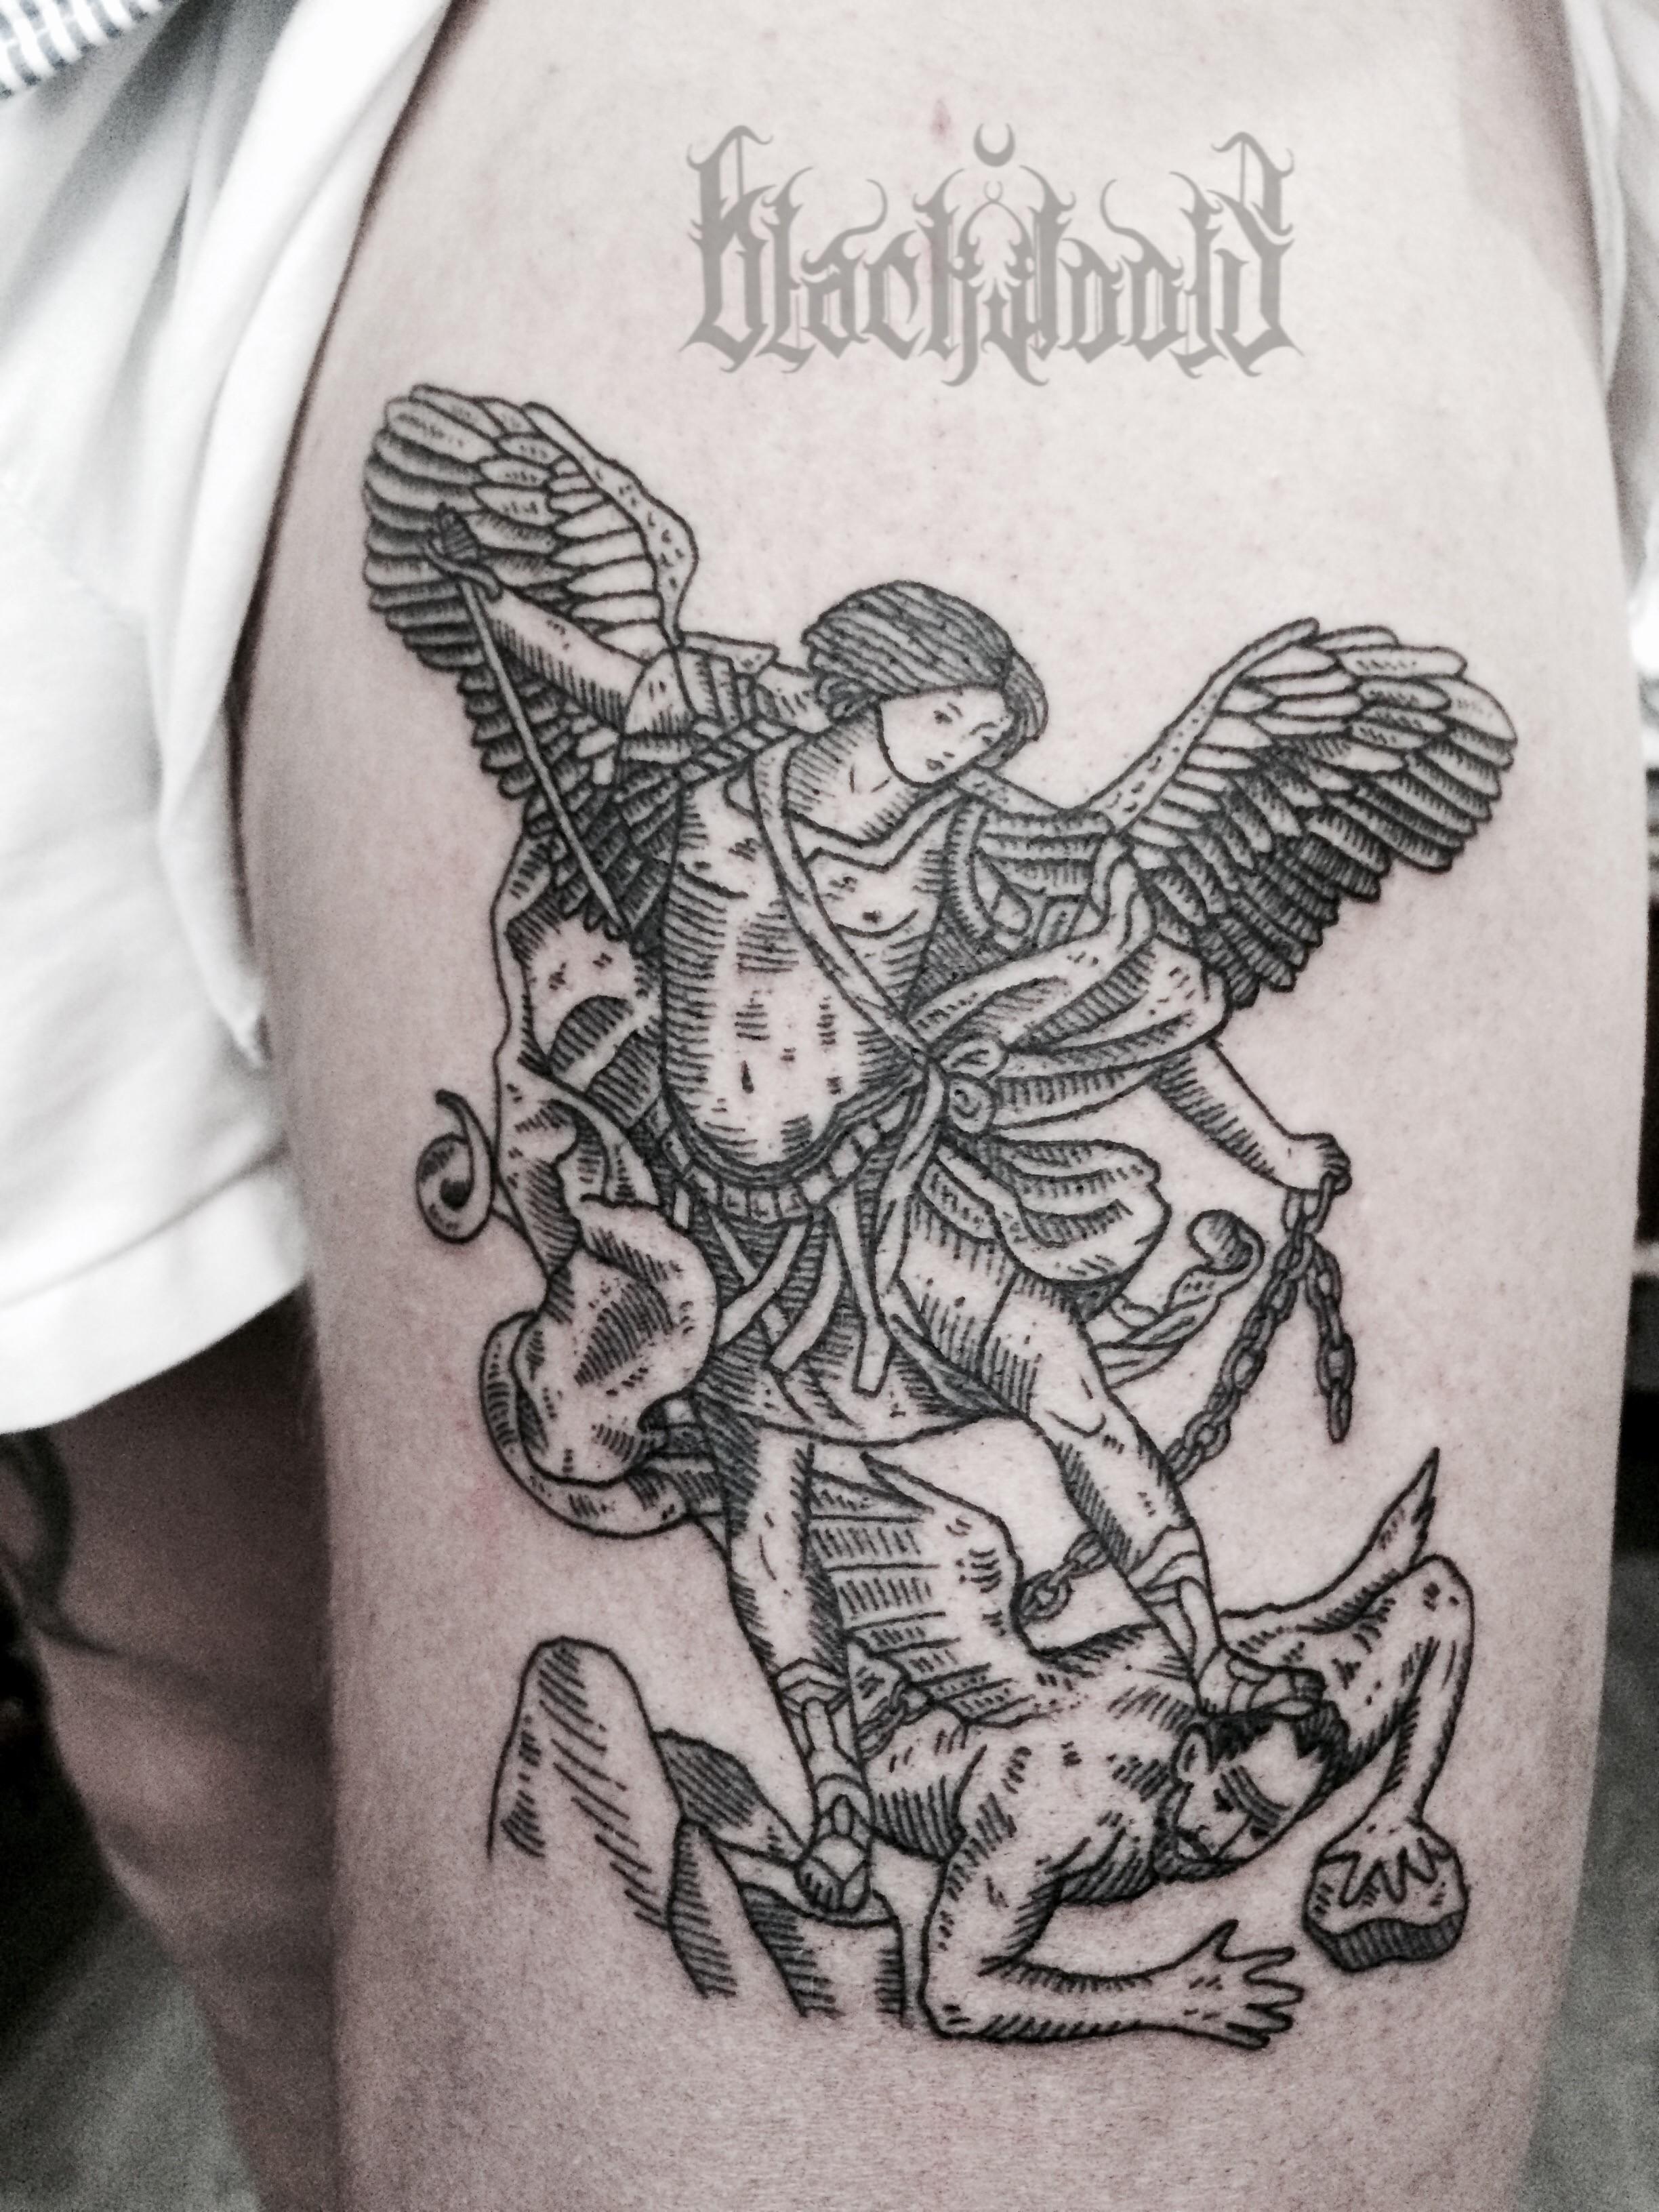 Ligera-ink-tattoo-milano-tatuaggi-milano-migliori-tatuatori-milano-tatuaggi-blackwork-milano-tatuaggio-angelo